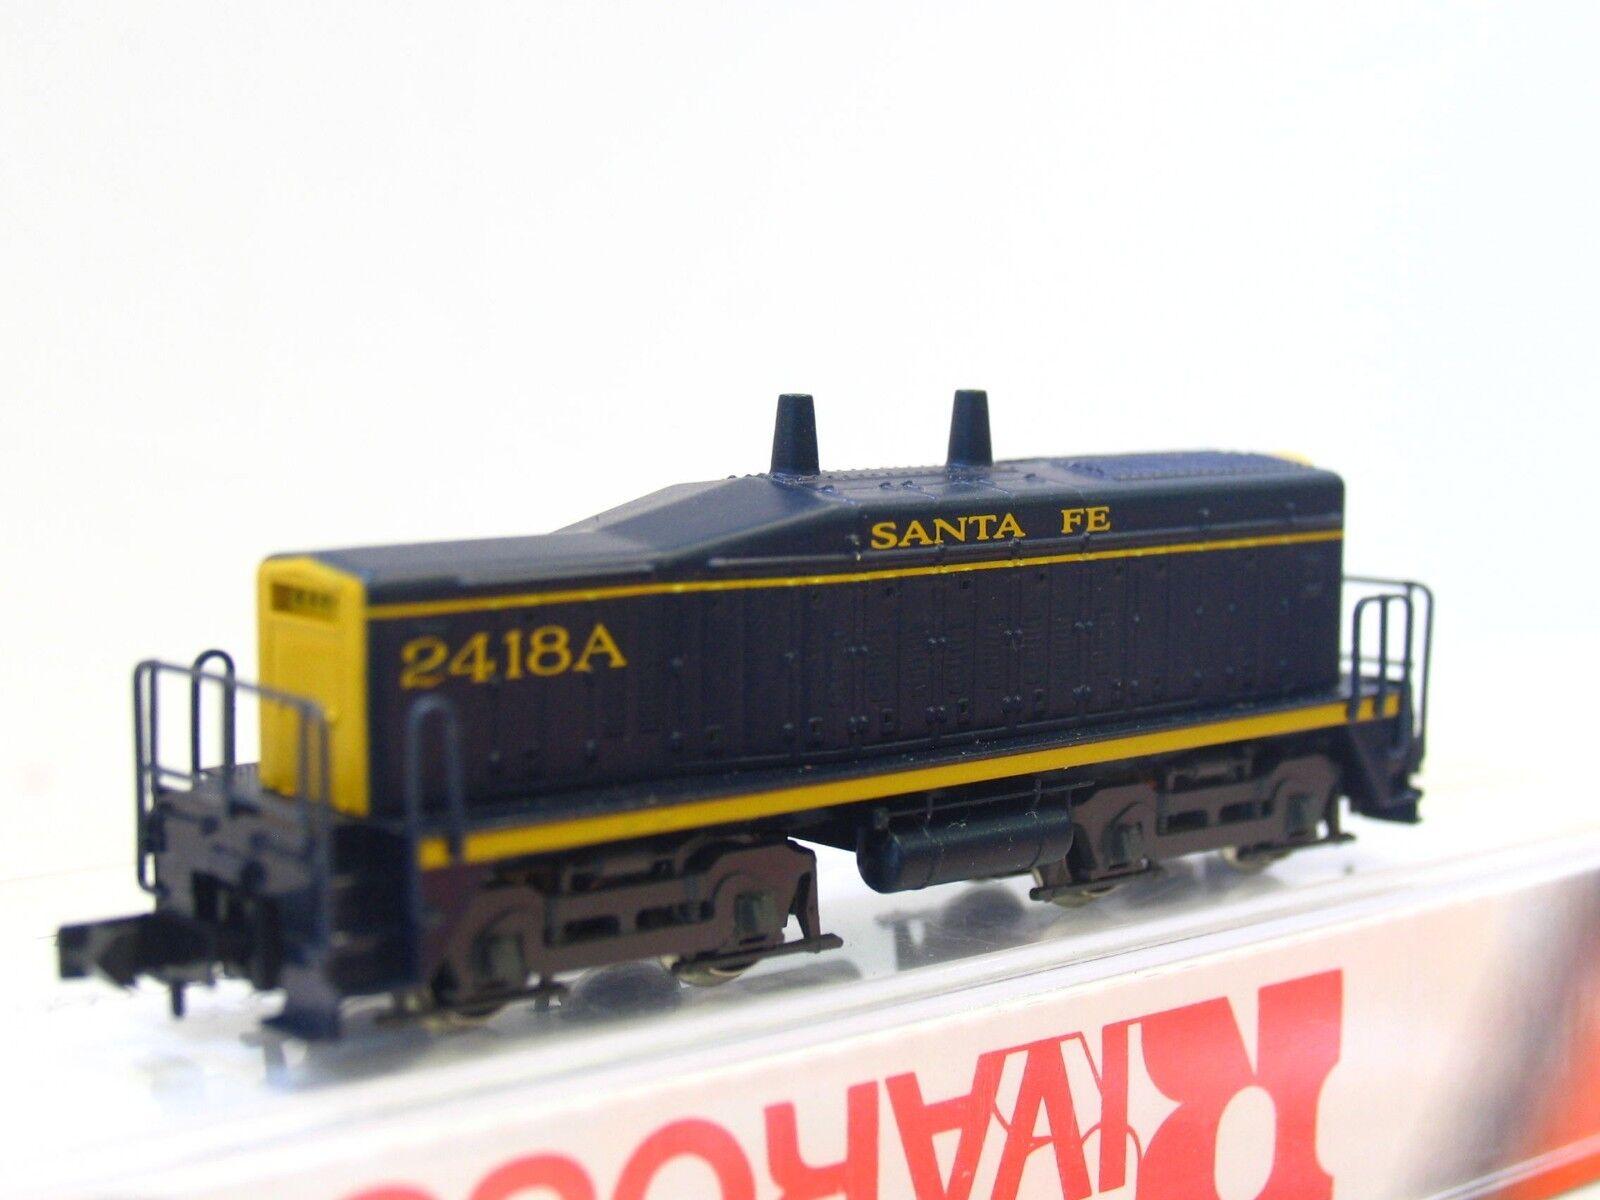 Arnold N 5120 Diesellok ohne Führerstand EMD SW 1500 2418A Santa Fe OVP (V5412)